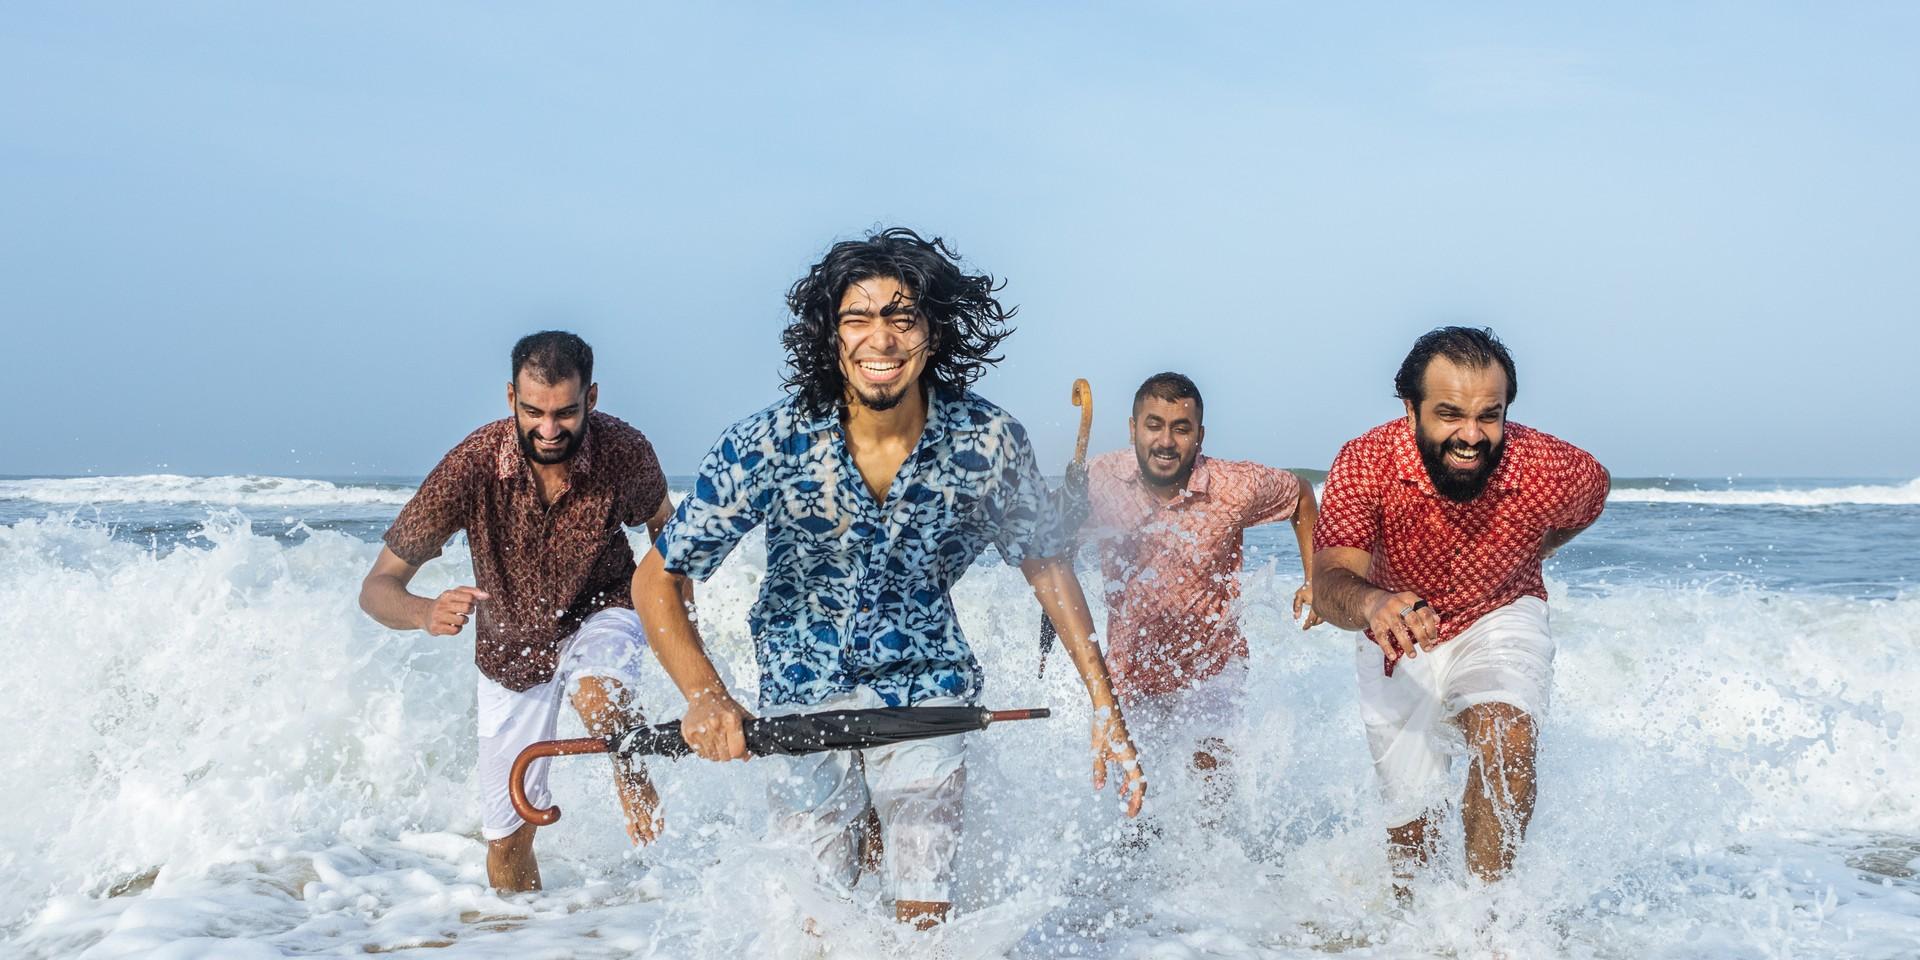 Asia Spotlight: India's When Chai Met Toast on sparking joy with their indie folk tunes